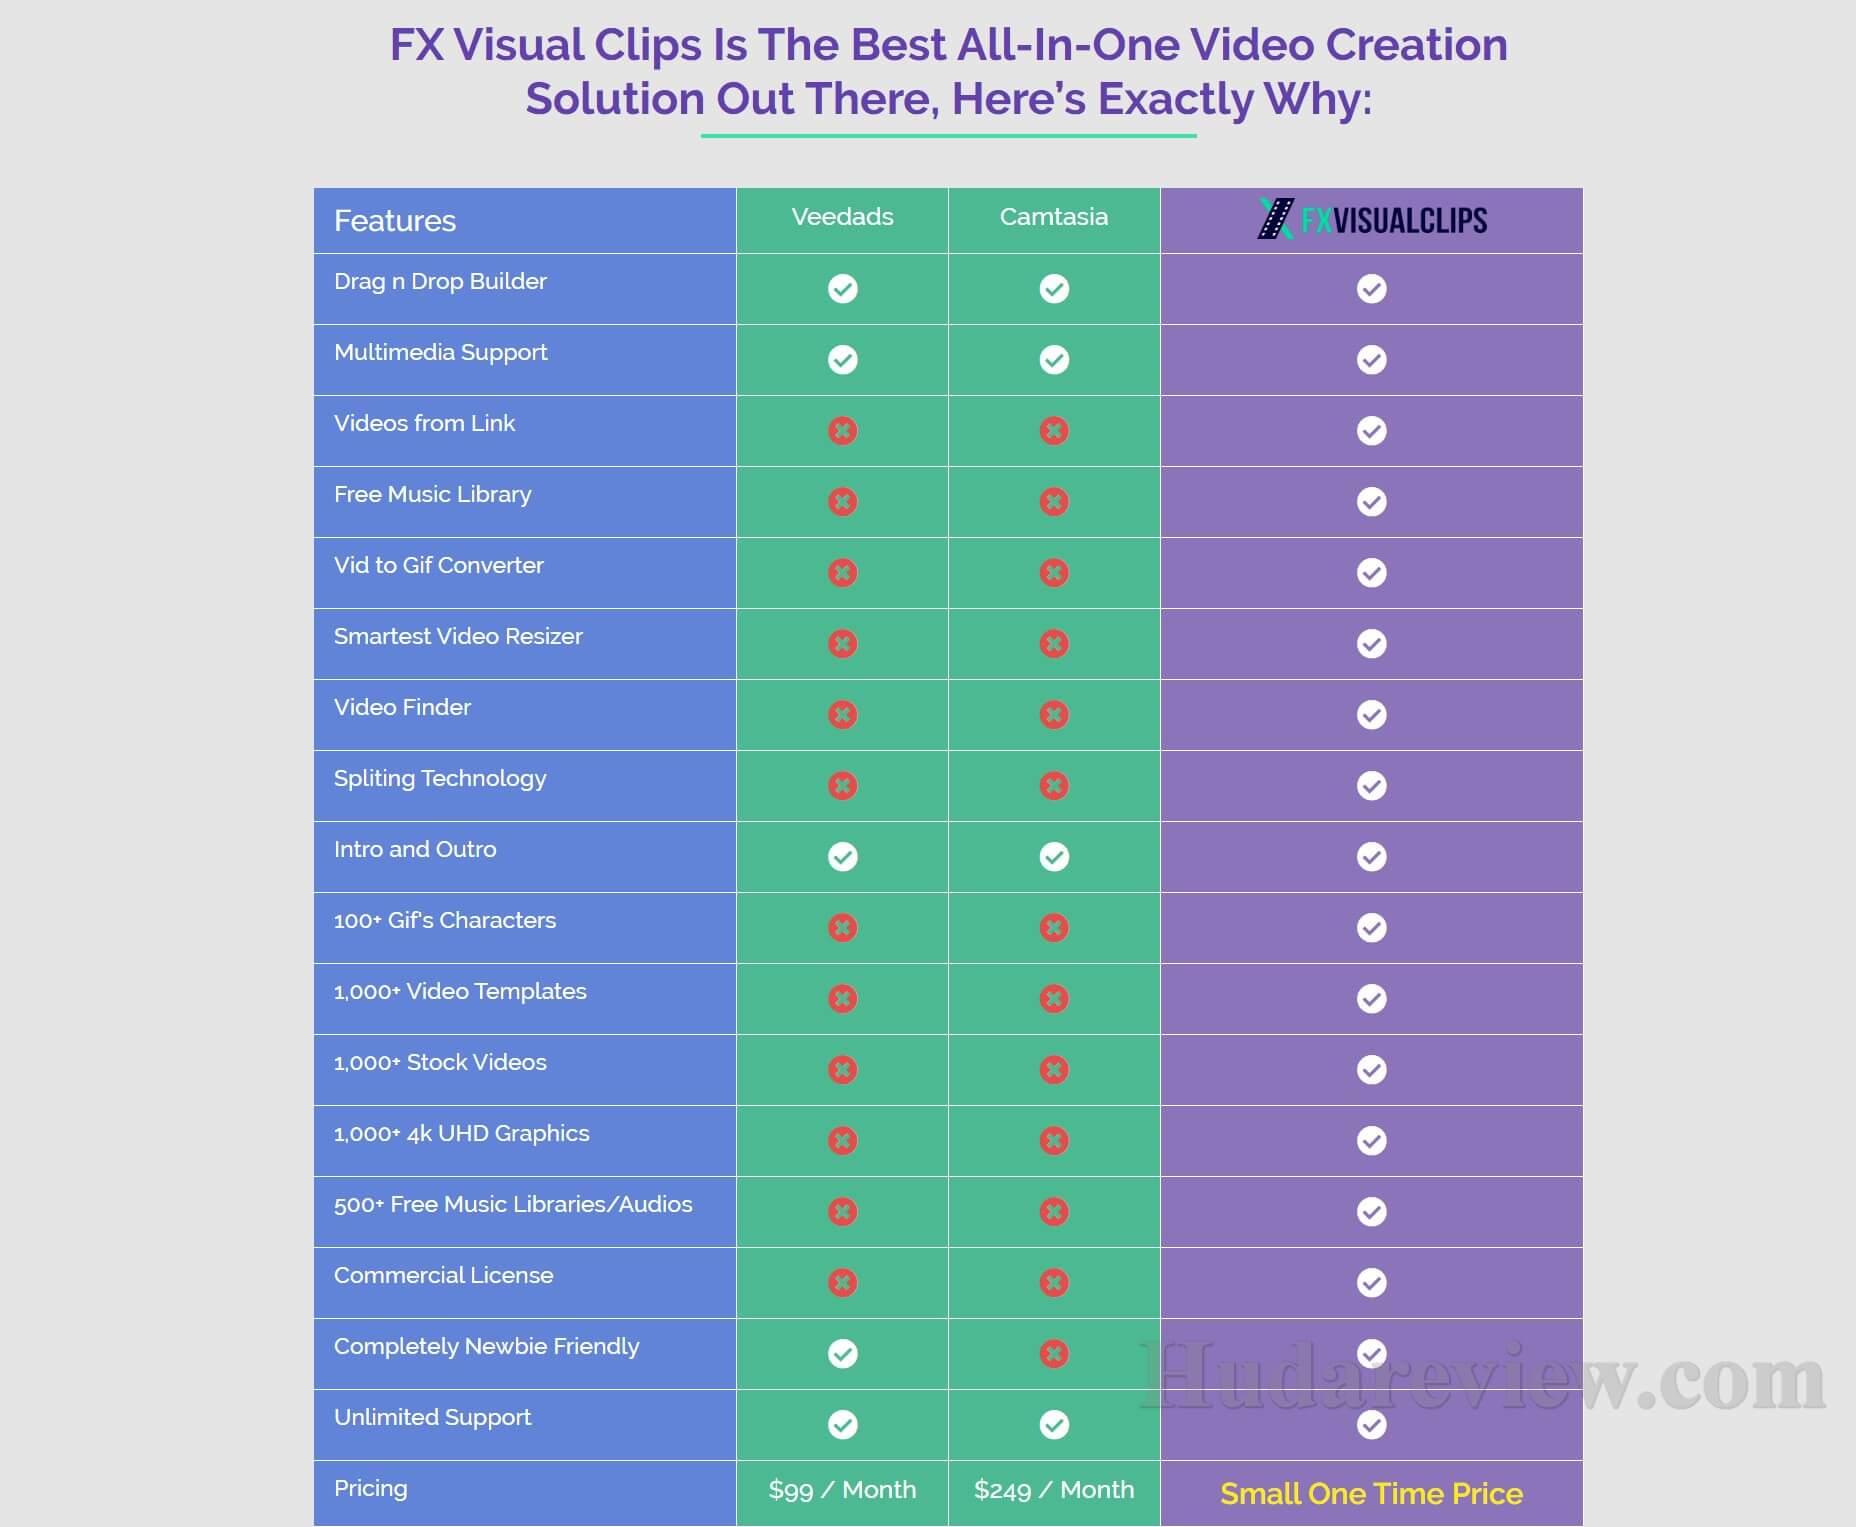 FX-Visual-Clips-Review-Comparison